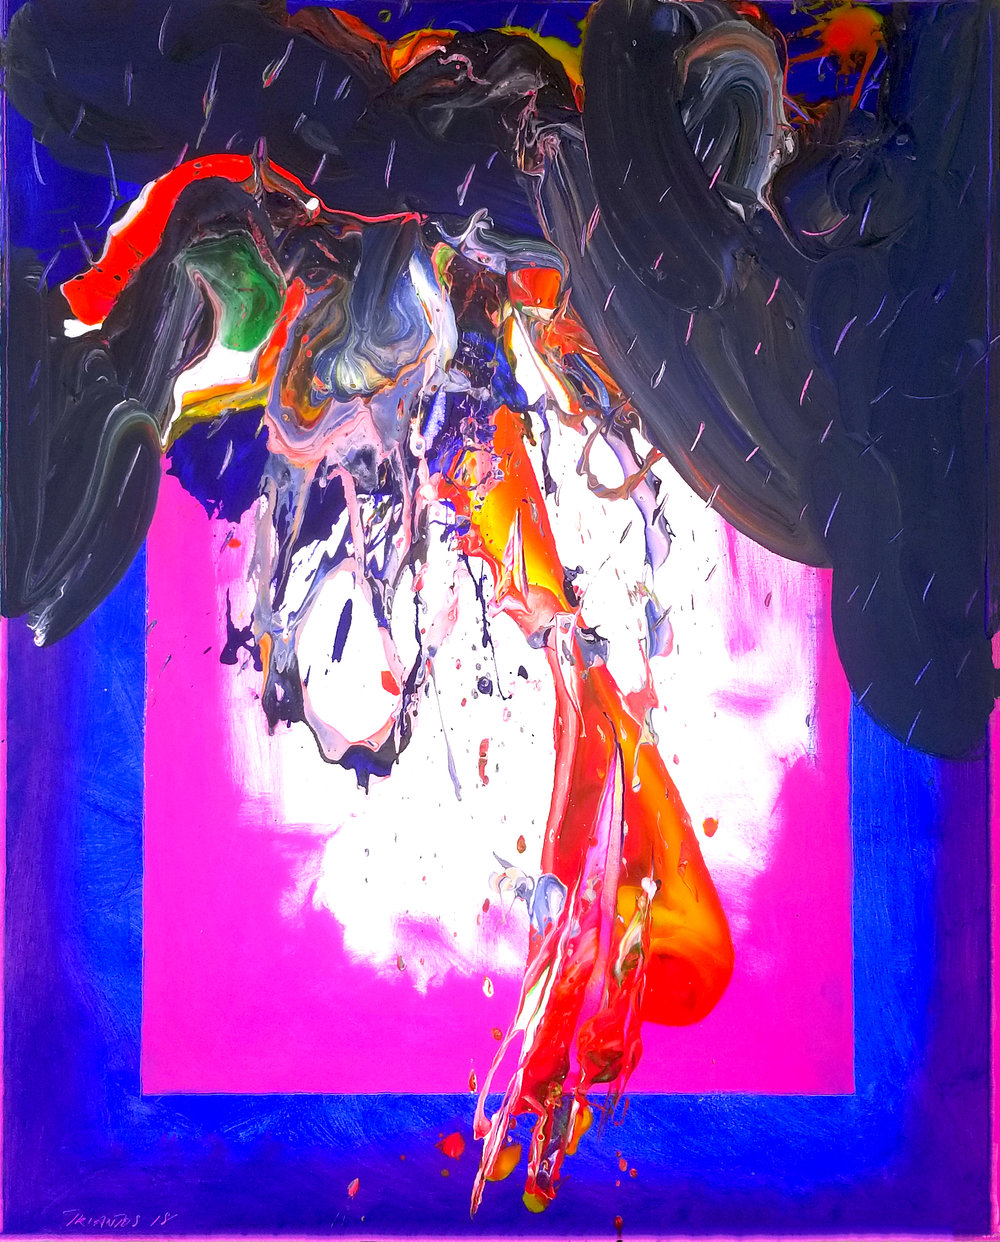 "Storm #5, 2018, acrylic on canvas, 60"" x 48"" (152.4 x 122 cm)"